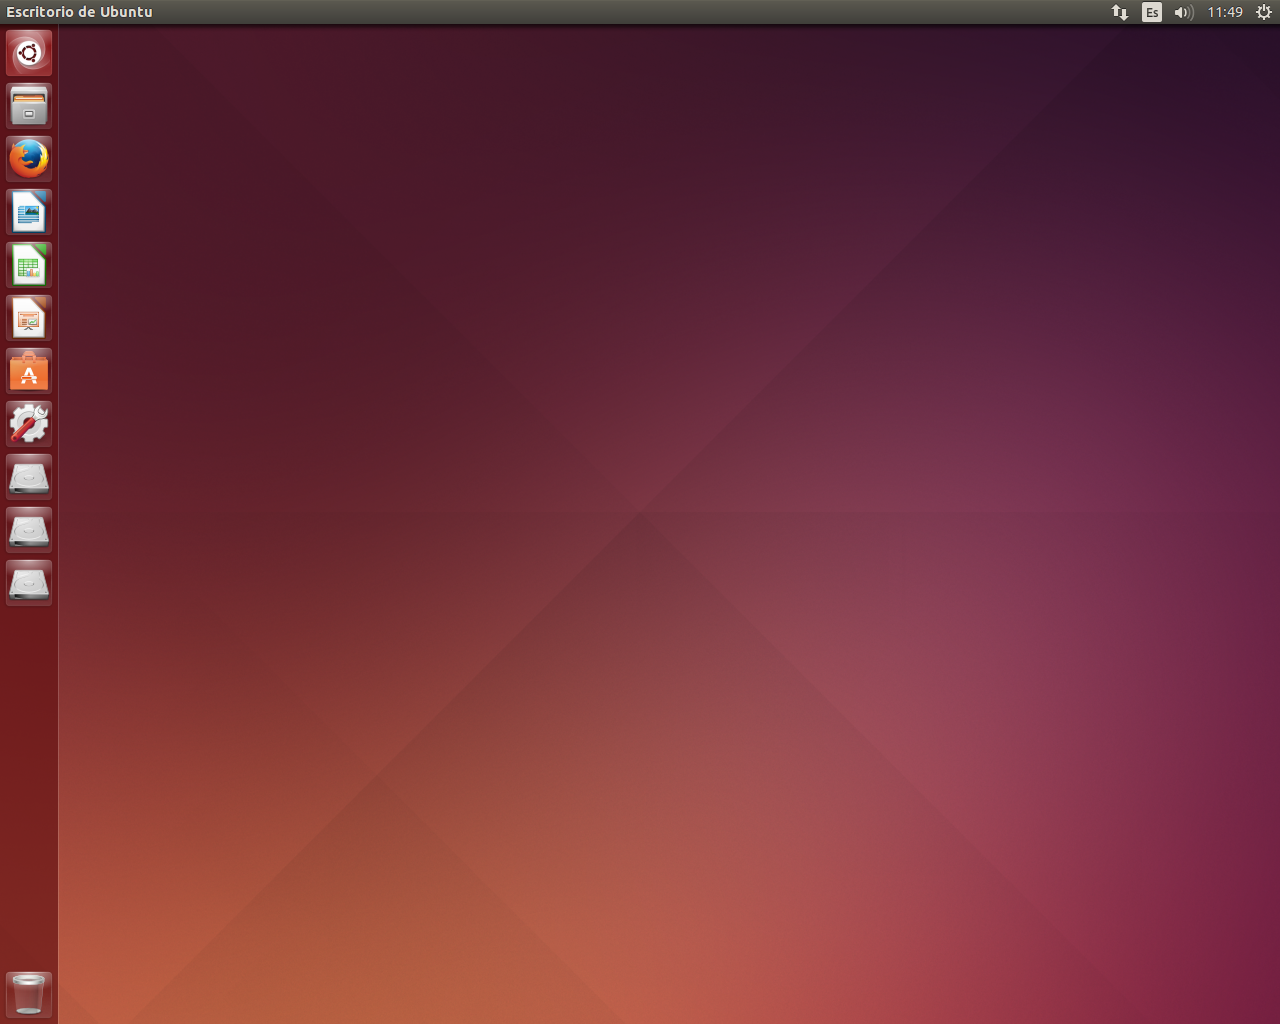 1 escritorio ubuntu lts trastetes. Black Bedroom Furniture Sets. Home Design Ideas